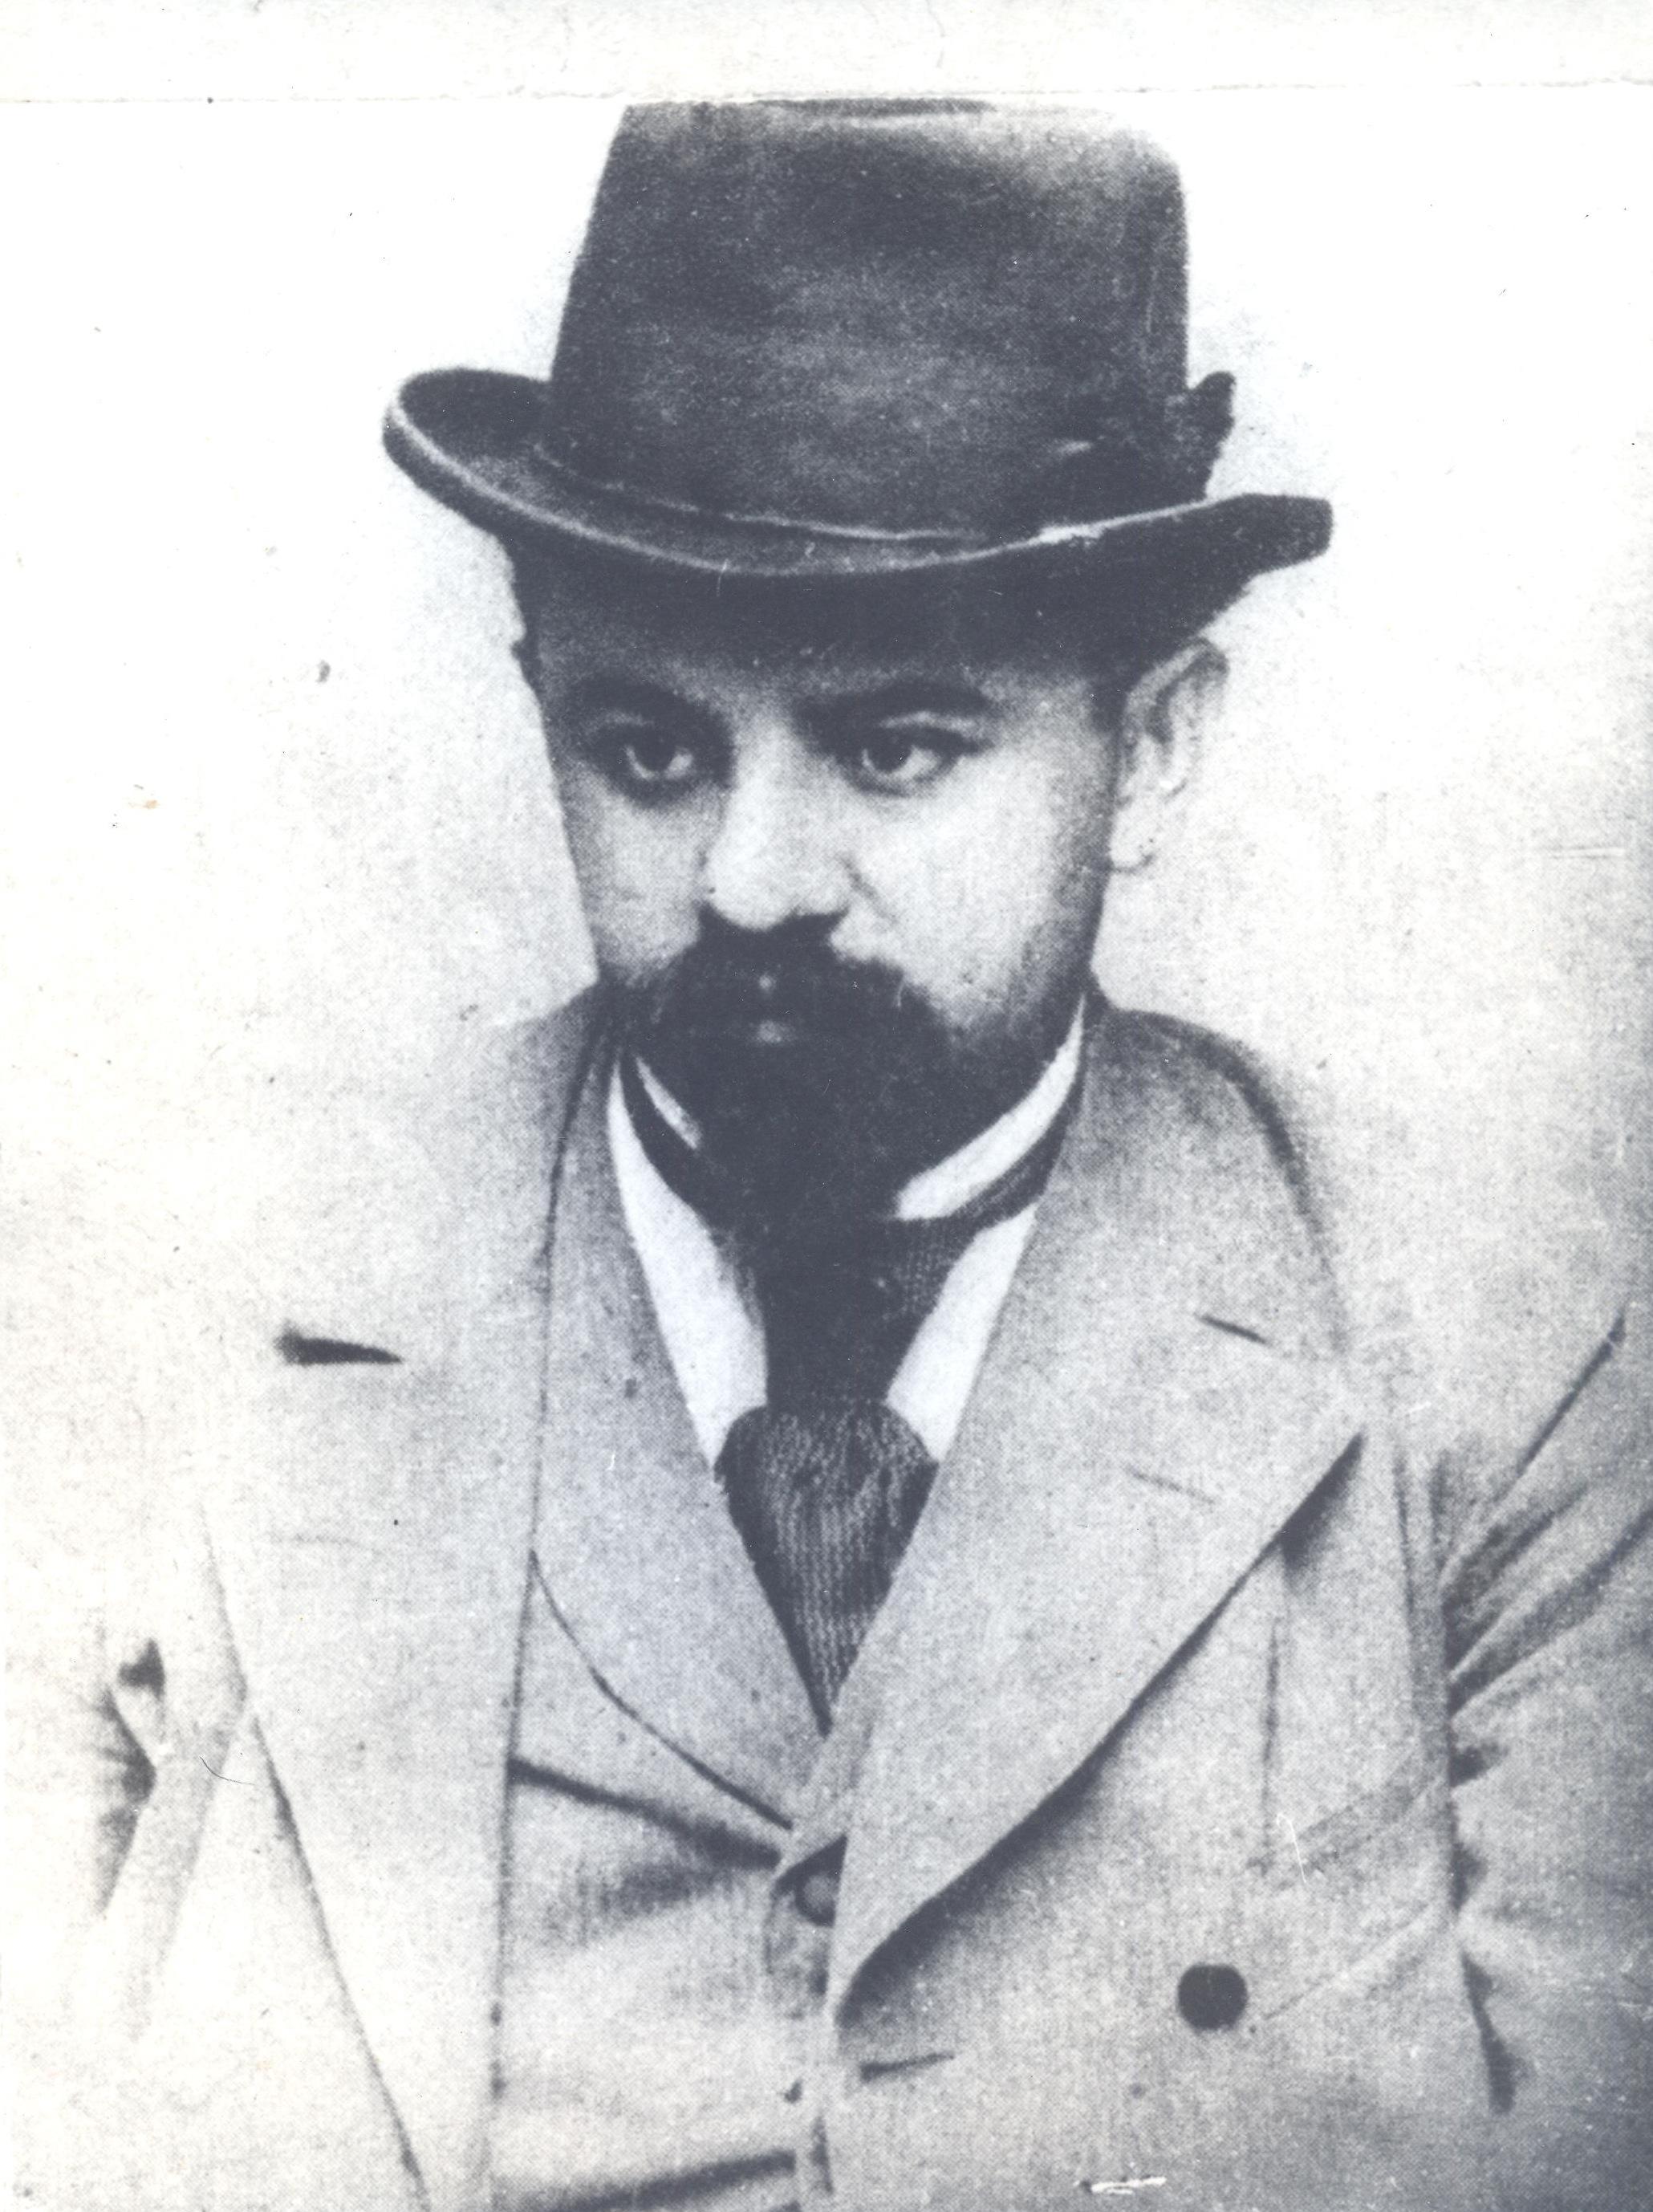 https://upload.wikimedia.org/wikipedia/commons/8/84/BASA-1735K-2-129-1-Pencho_Slaveykov.jpg